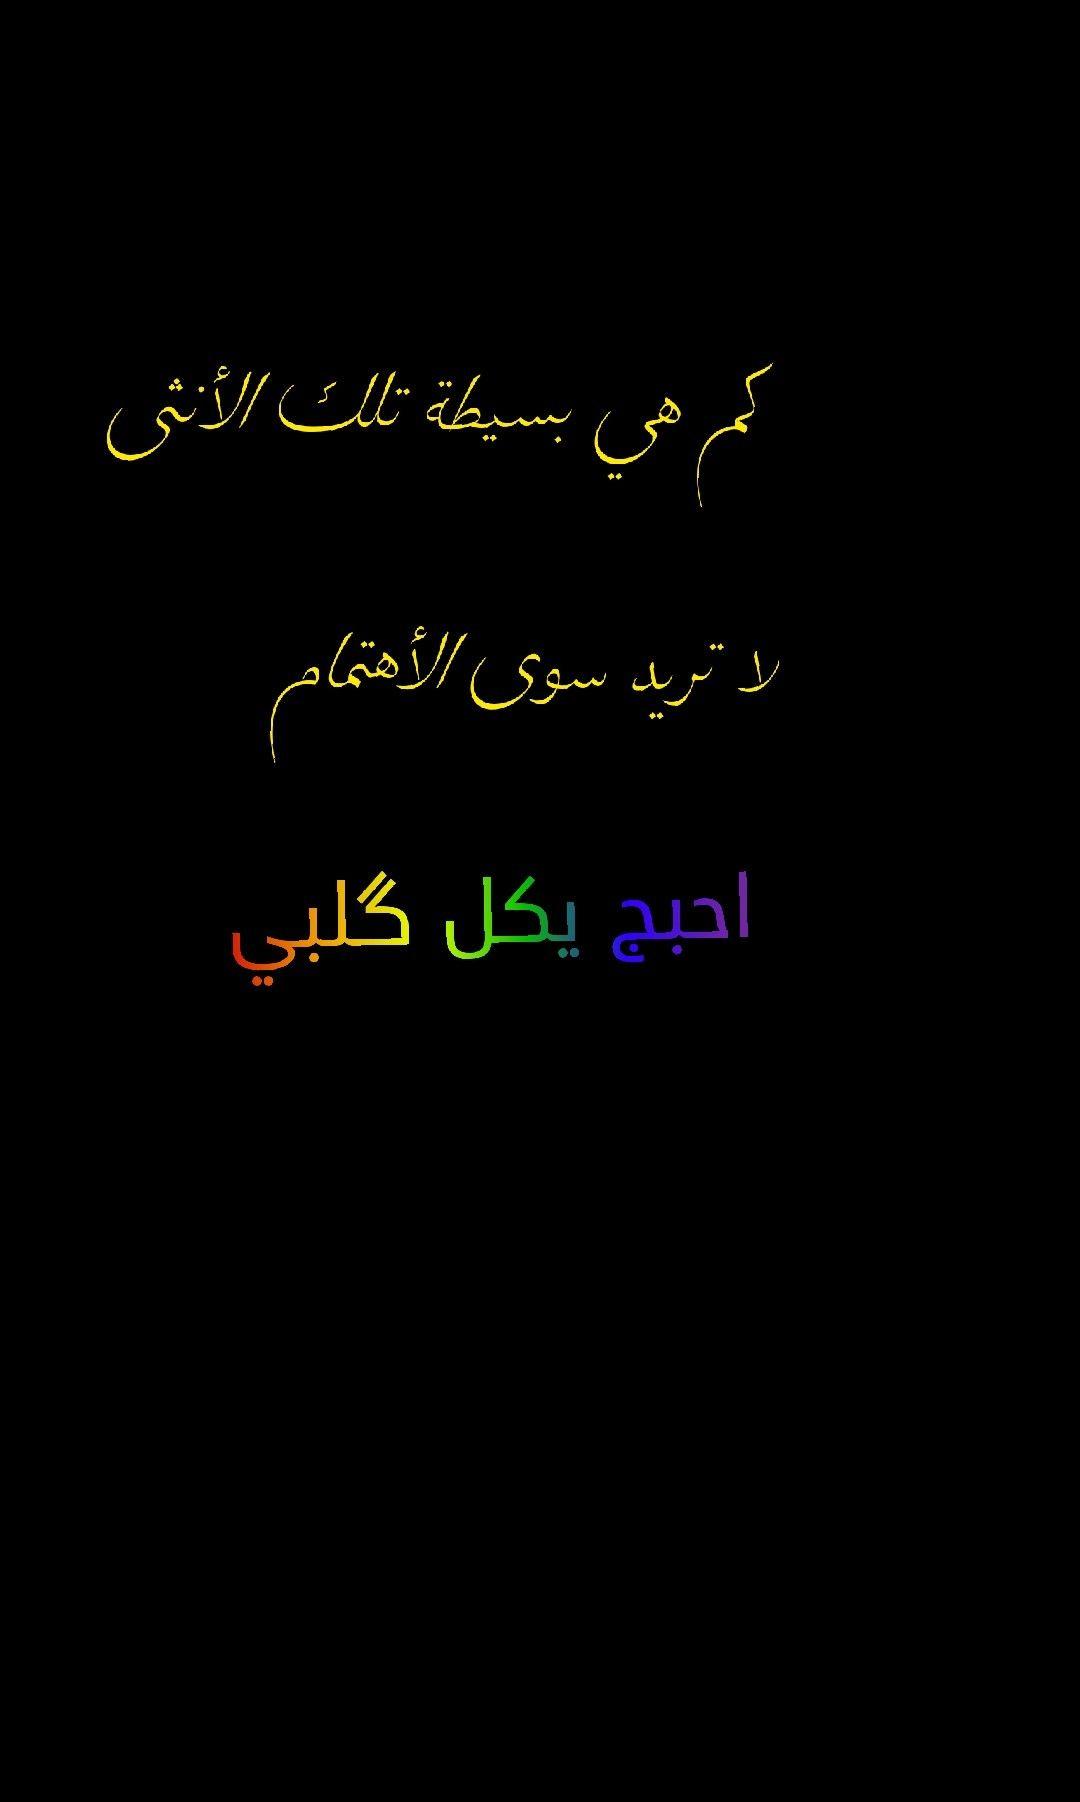 اخخخخ اشتاقيتلج Calligraphy Arabic Calligraphy Arabic